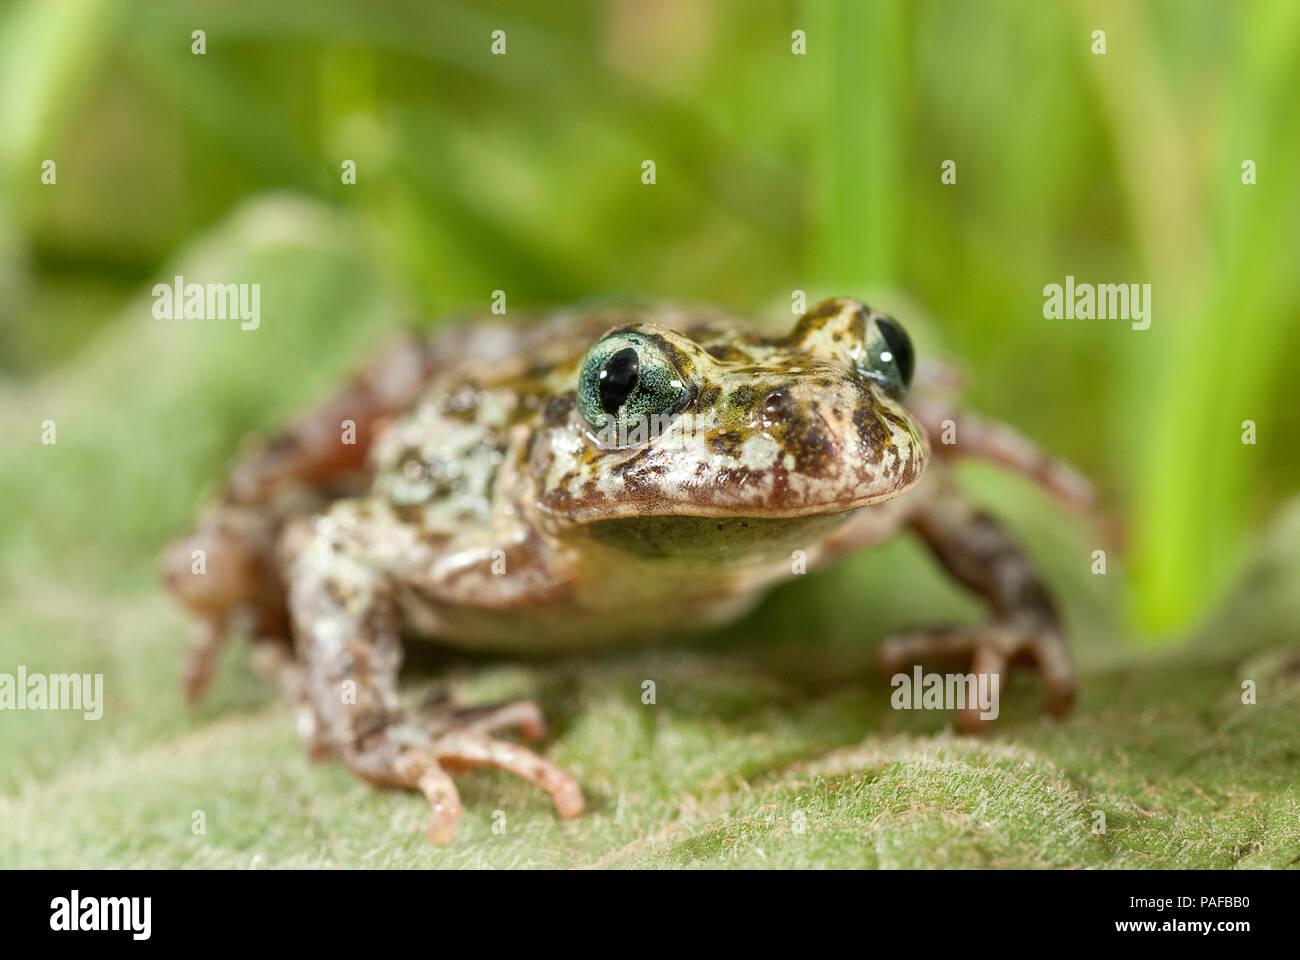 Iberian speckled sapillo (Pelodytes ibericus), amphibian - Stock Image